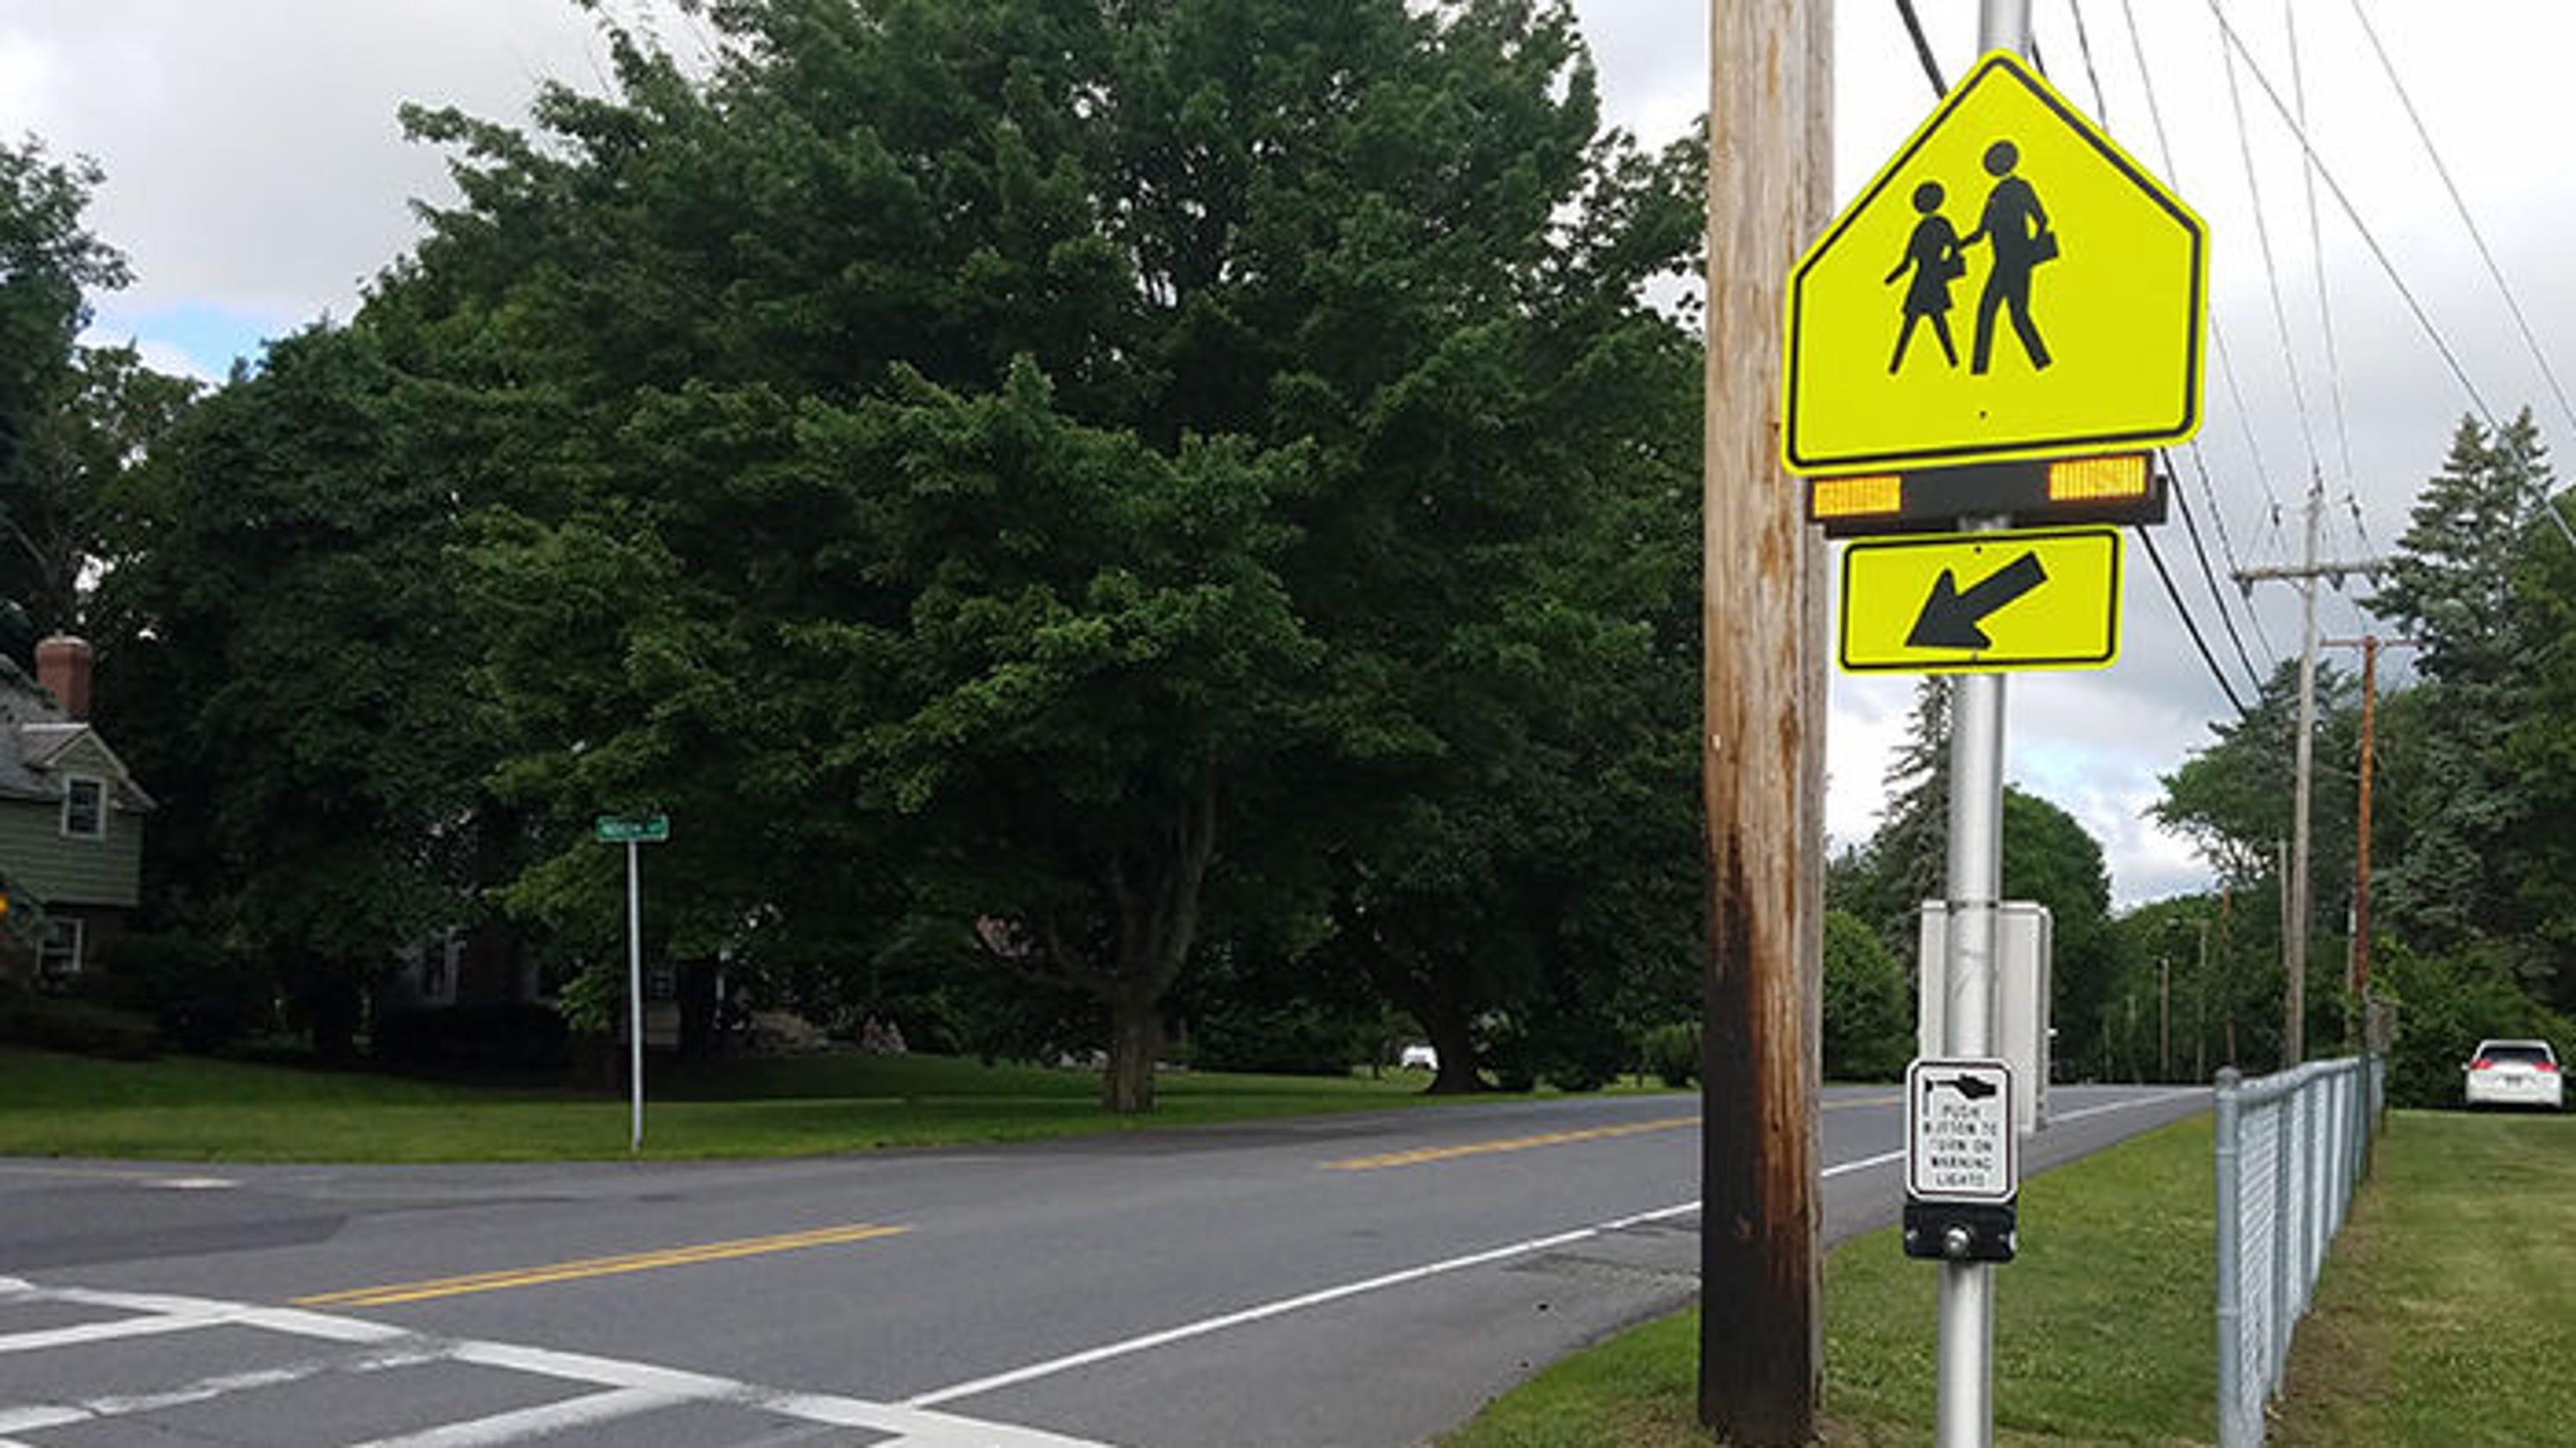 Cincinnati Police Traffic Safety Blitz Program Starts Tuesday